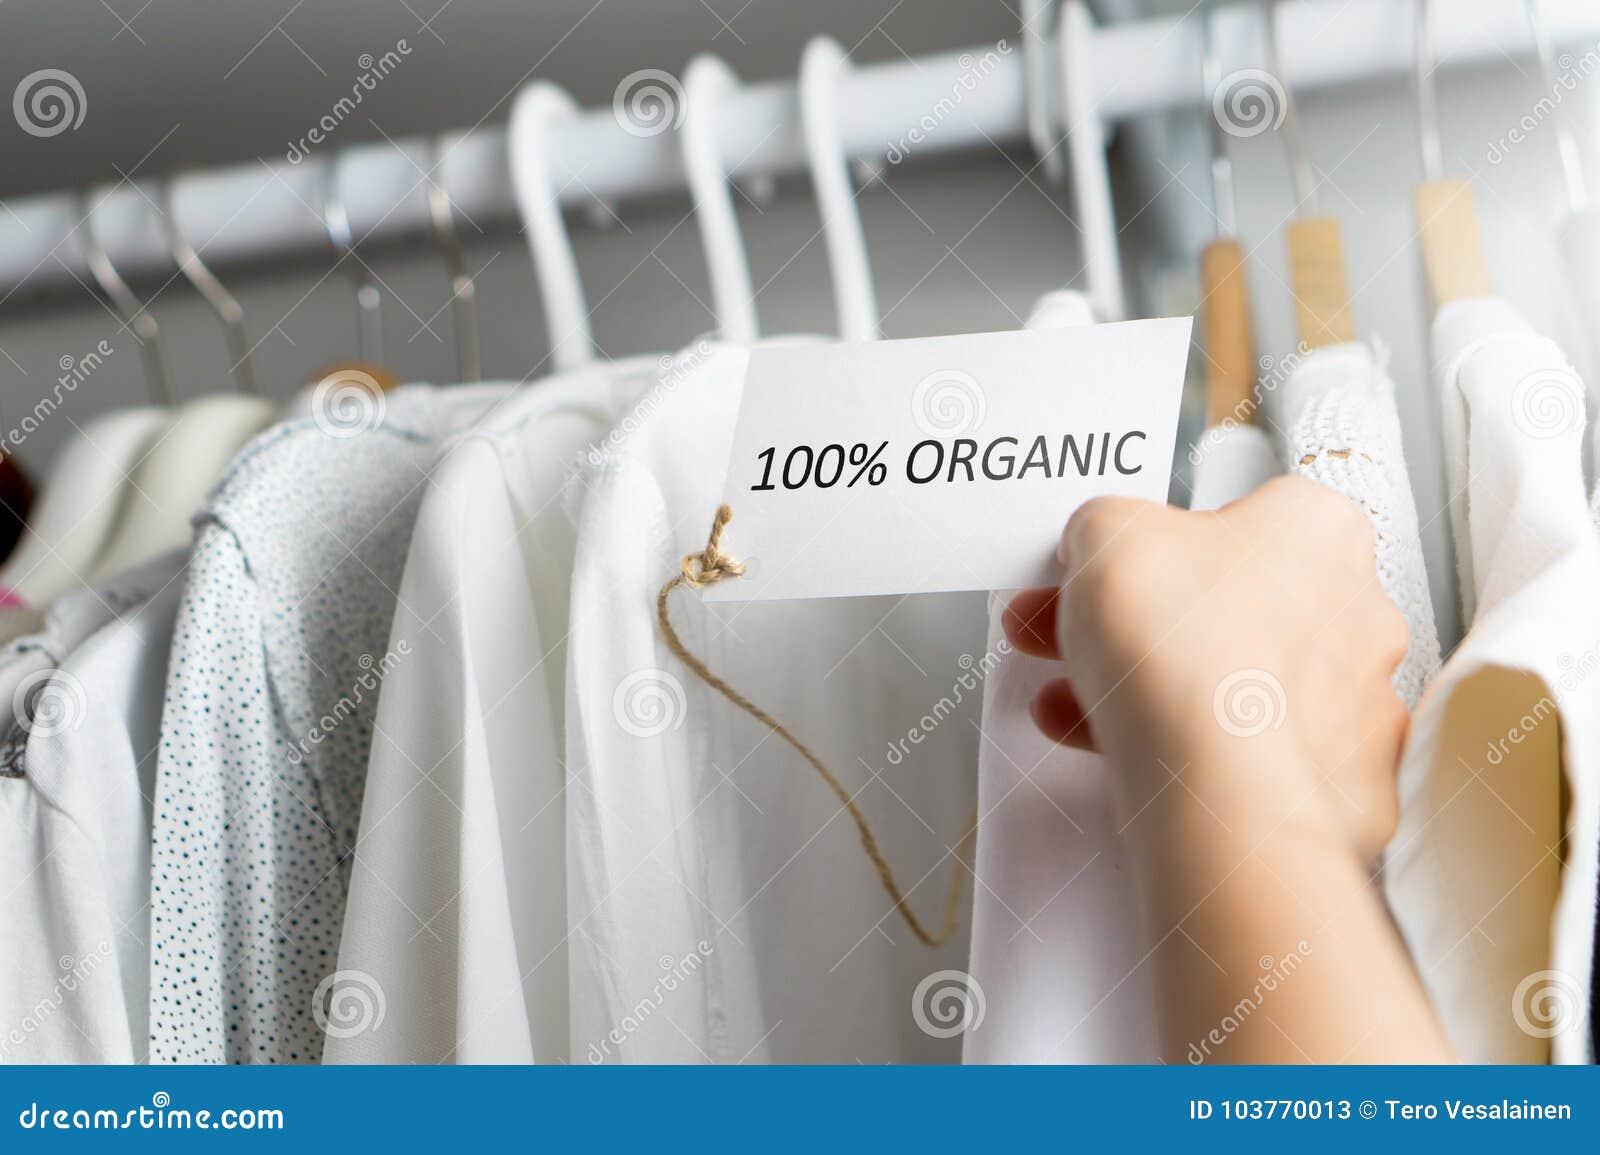 Made of 100  organic materials.